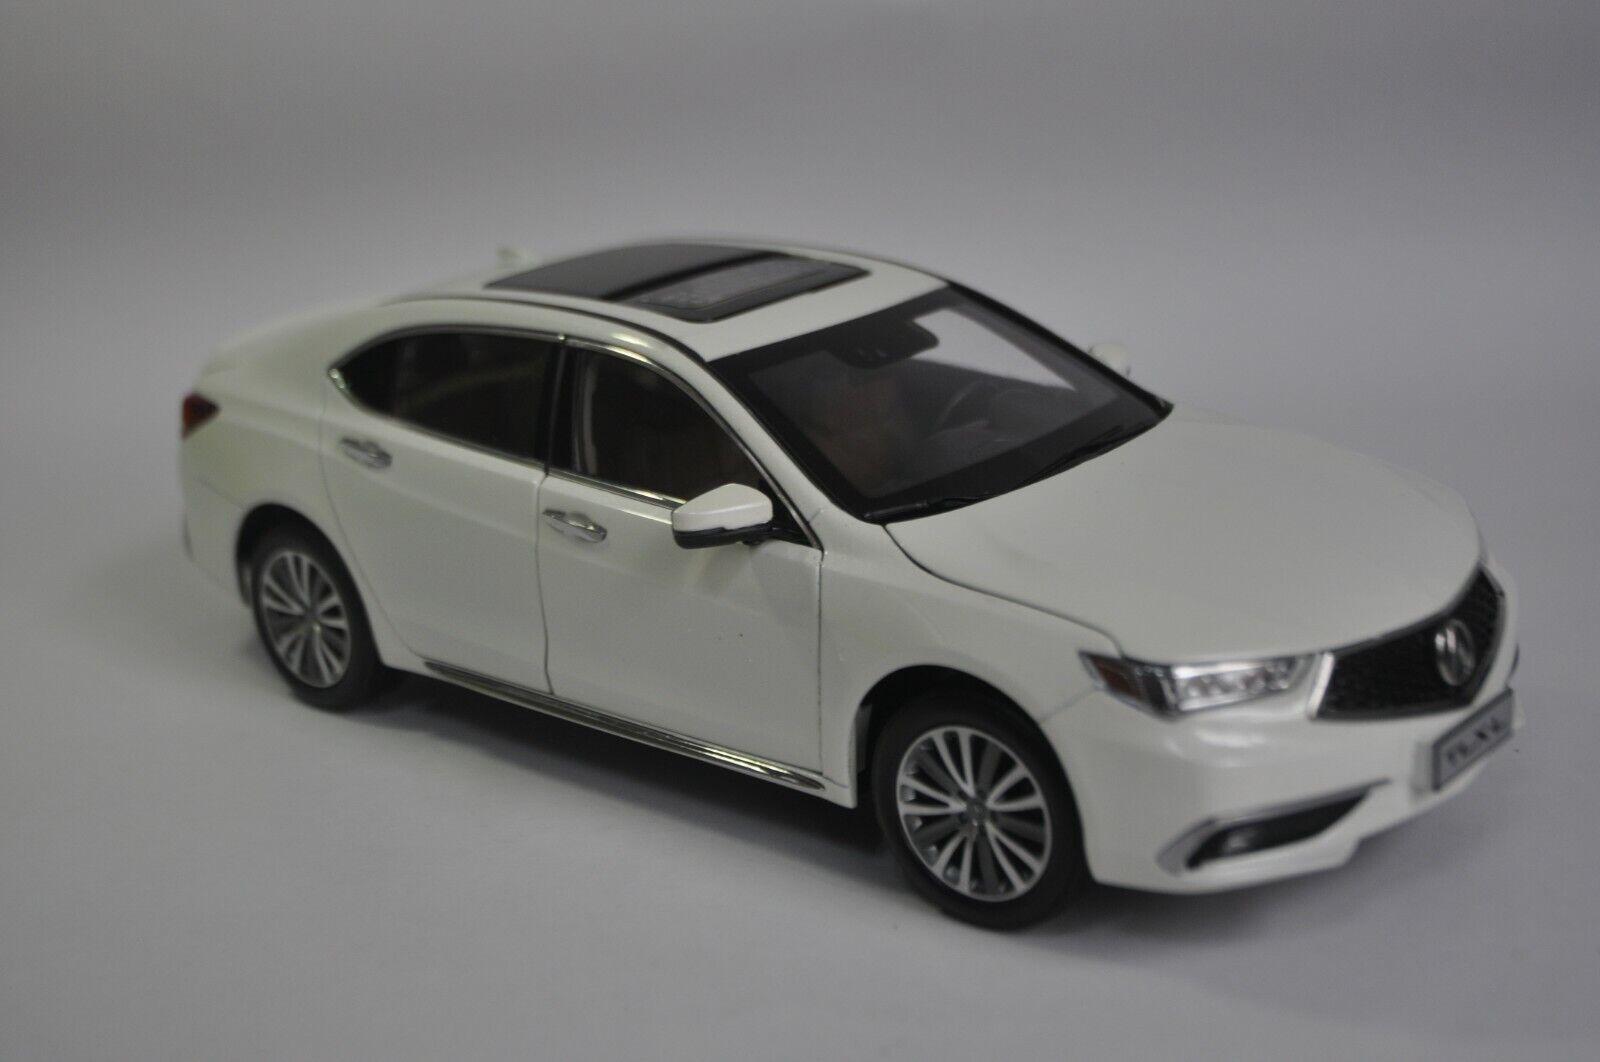 Acura TLX.L car model in scale 1 18 White